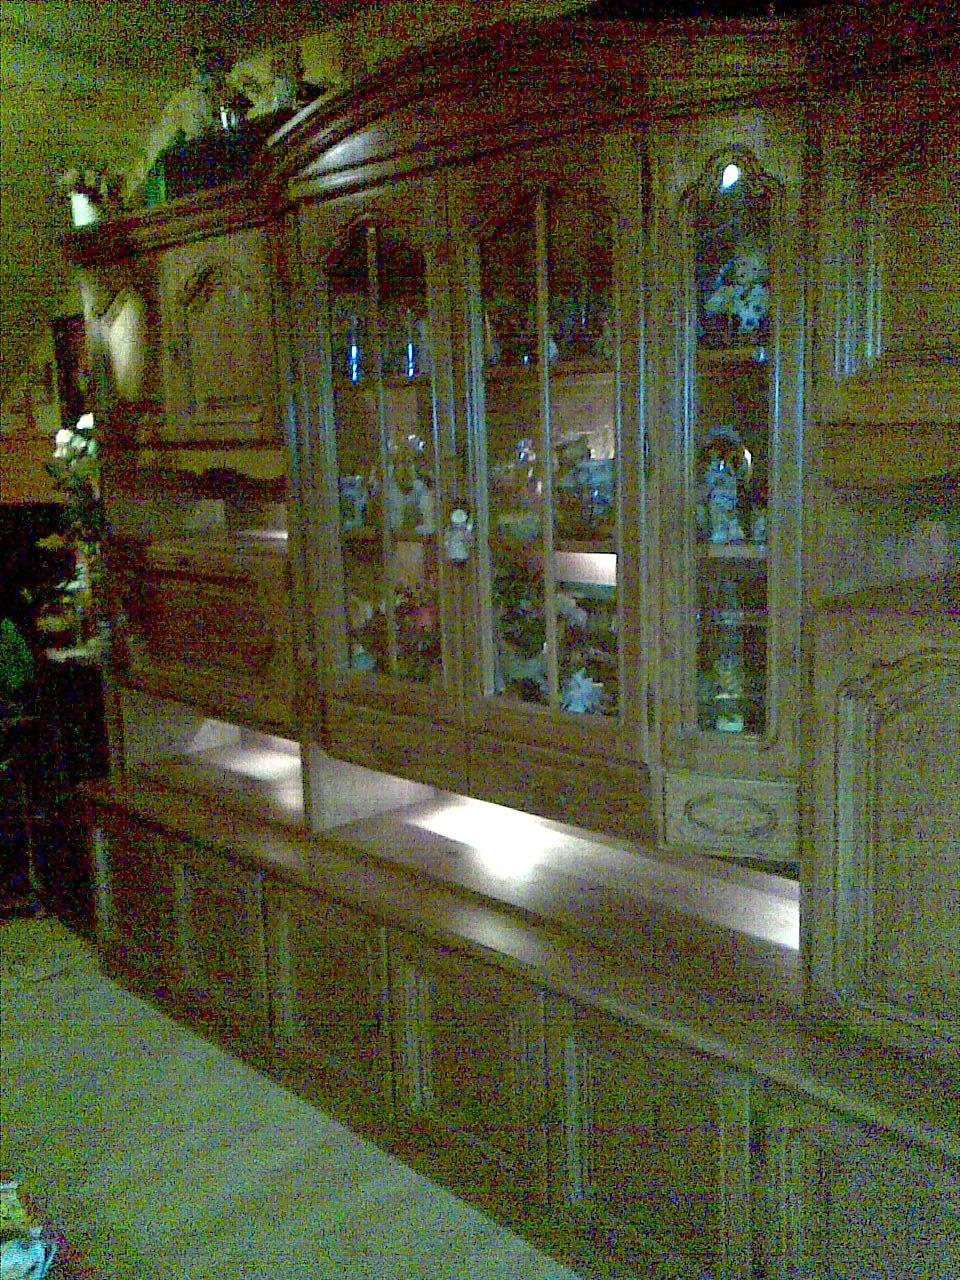 wohnzimmerschrank eiche:Wohnzimmerschrank Eiche rustikal massiv m. Beleuchtung